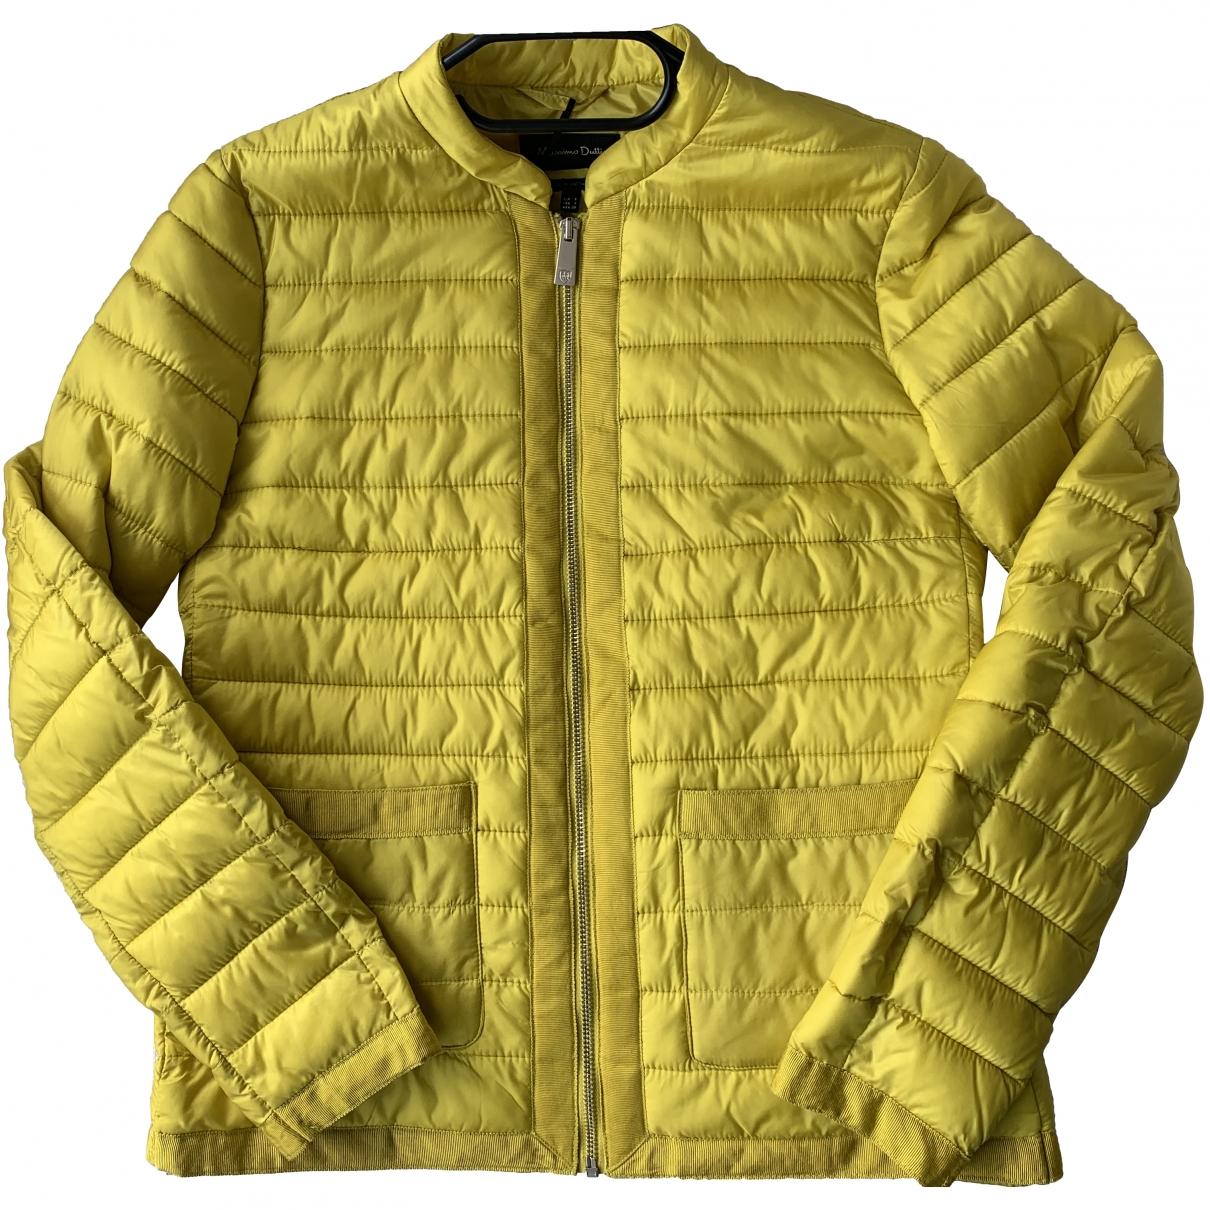 Massimo Dutti \N Yellow jacket for Women 36 FR